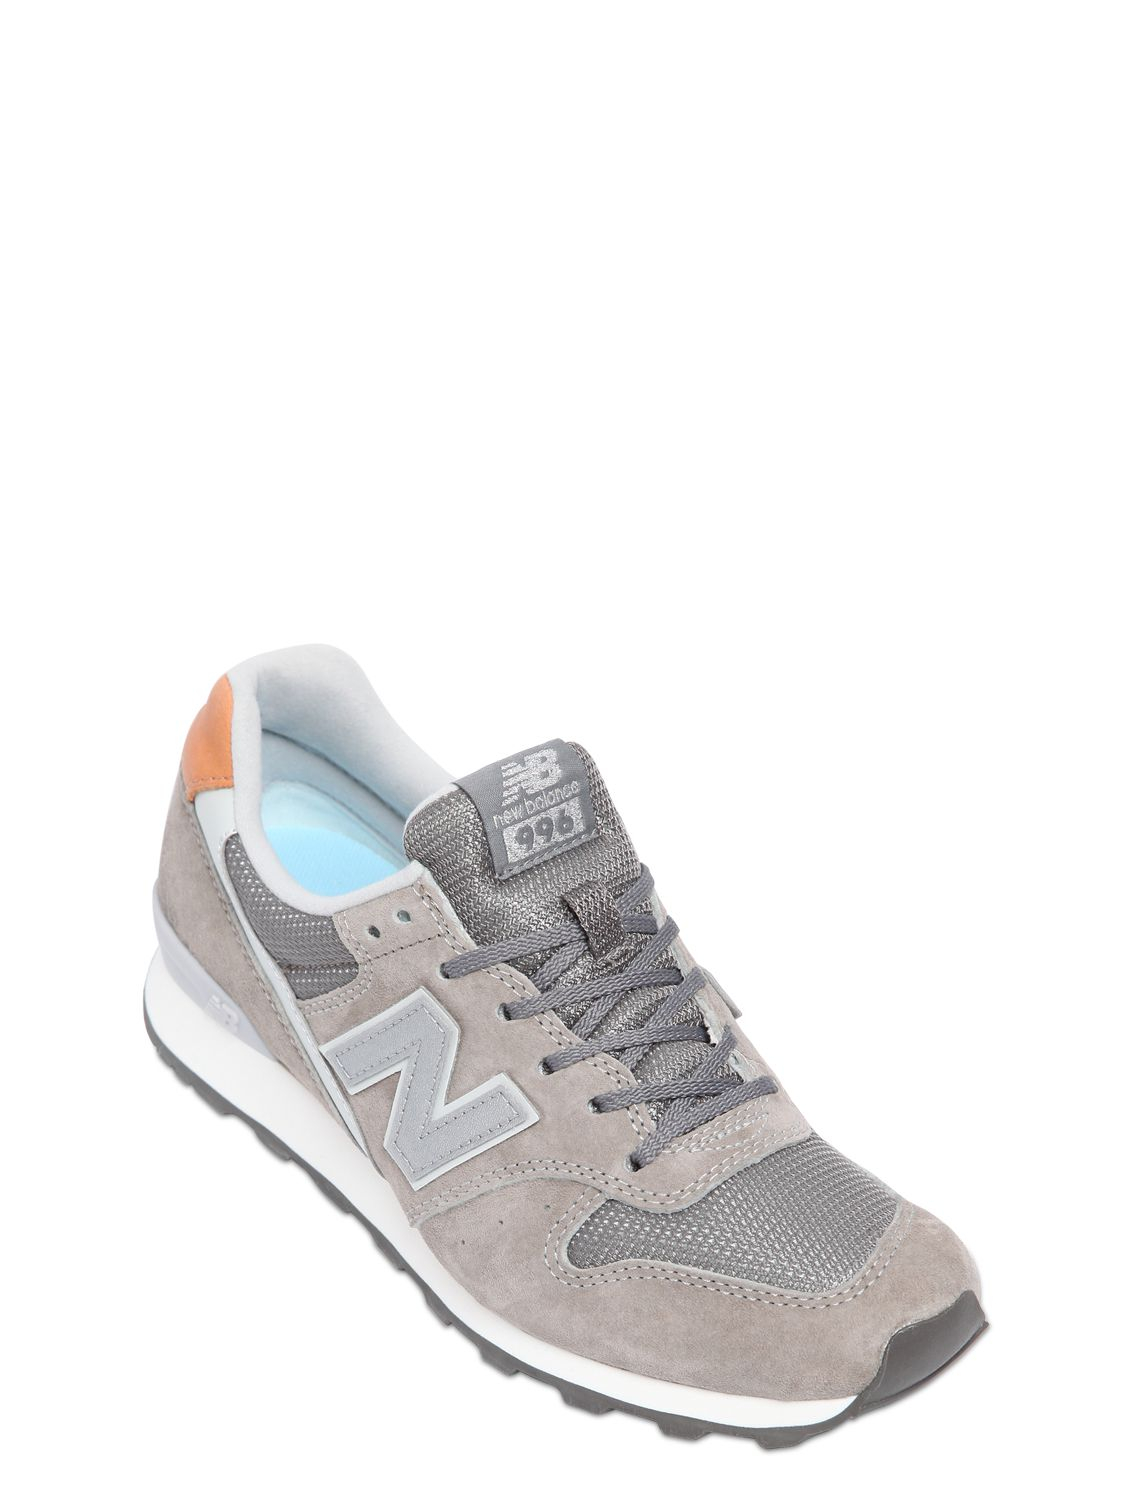 womens new balance light grey 996 trainers